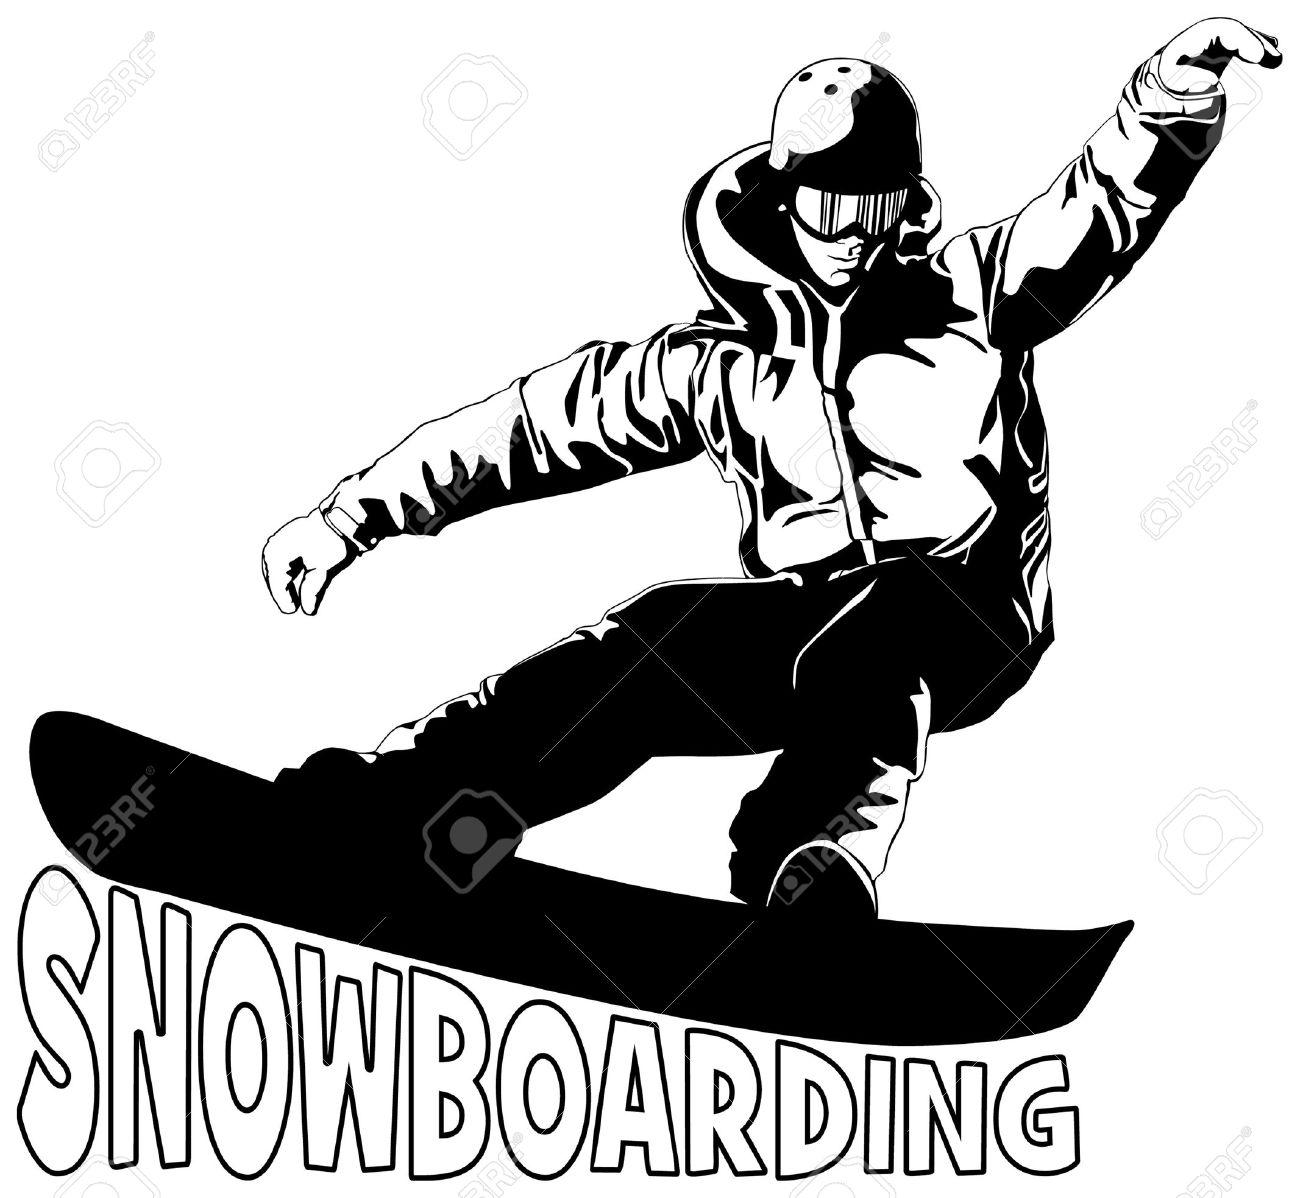 Office com holding a snowboard clipart black and white banner black and white library Snowboard clipart vector - 168 transparent clip arts, images ... banner black and white library